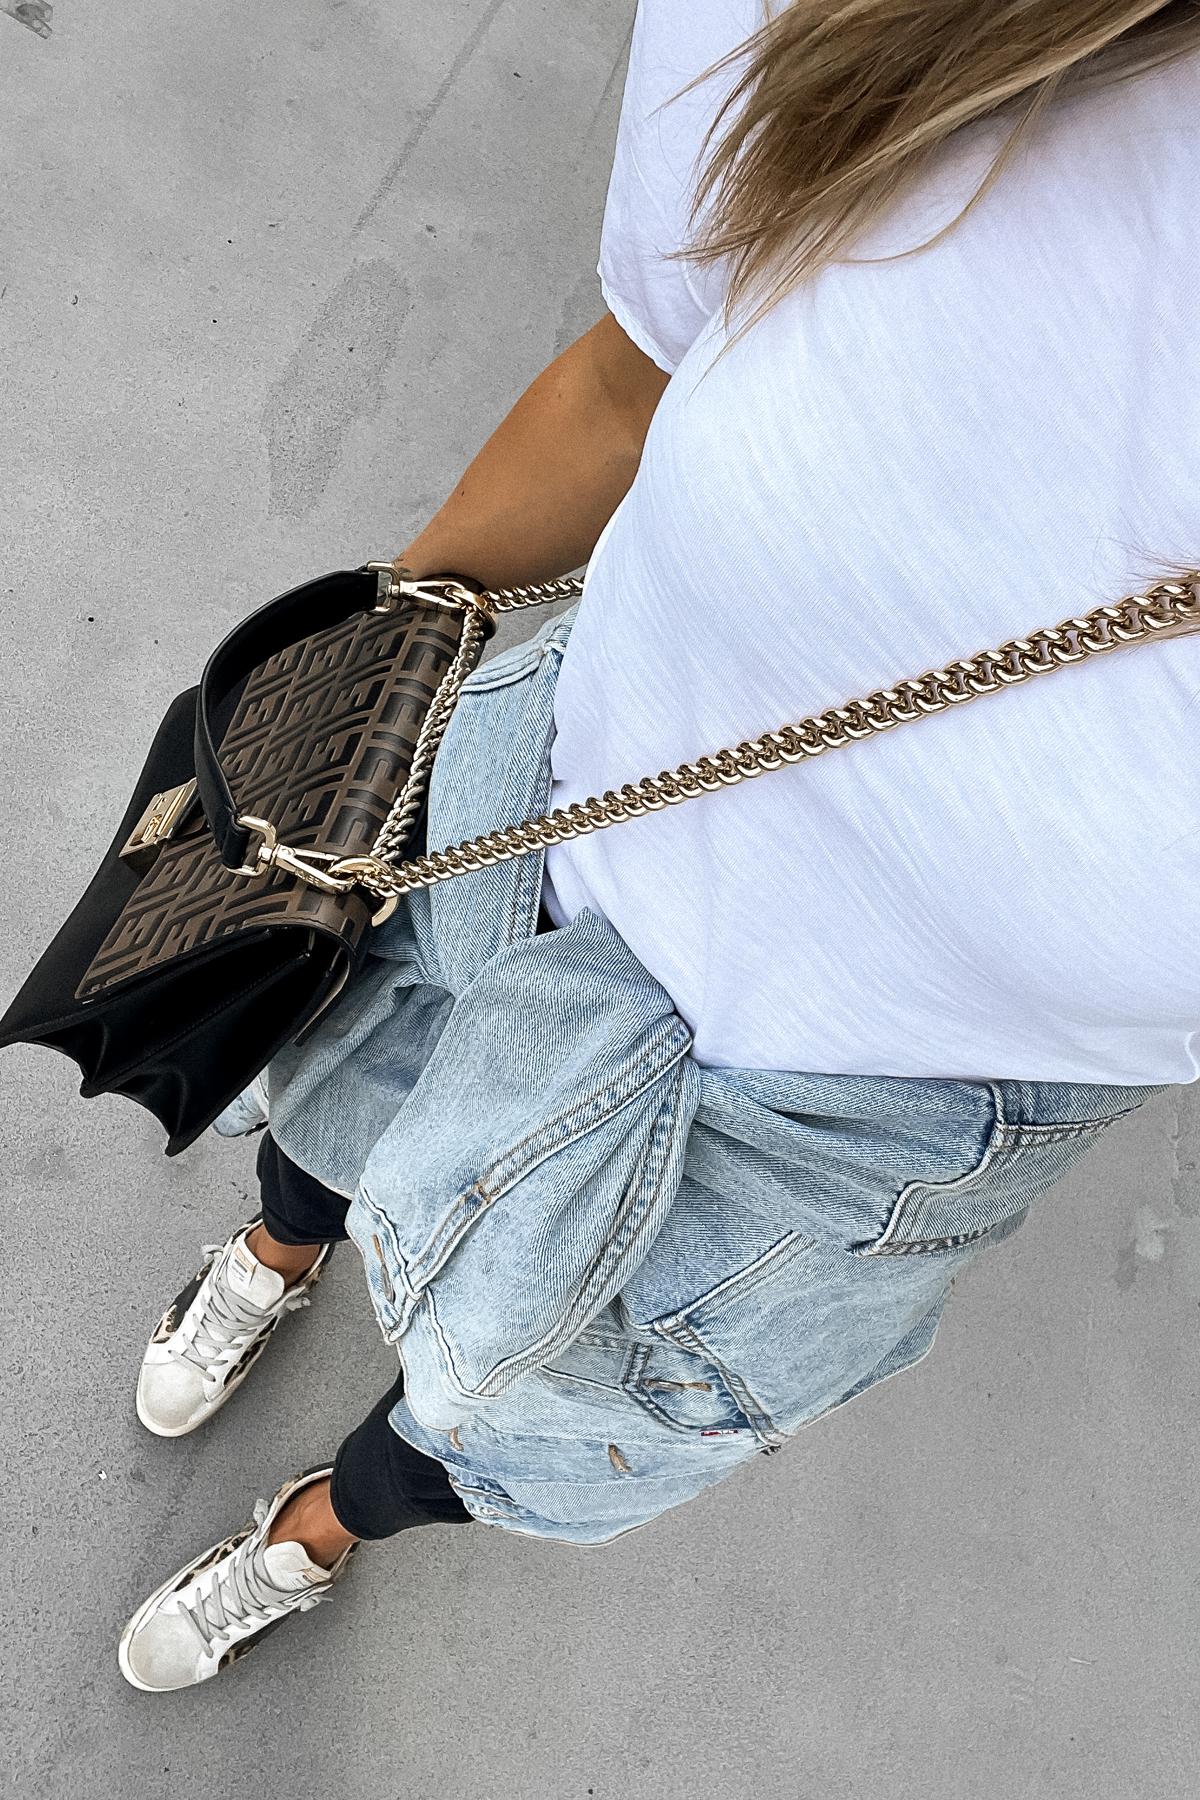 Fashion Jackson Wearing White Top Black Jeans Denim Jacket Leopard Golden Goose Sneakers Fendi Handbag